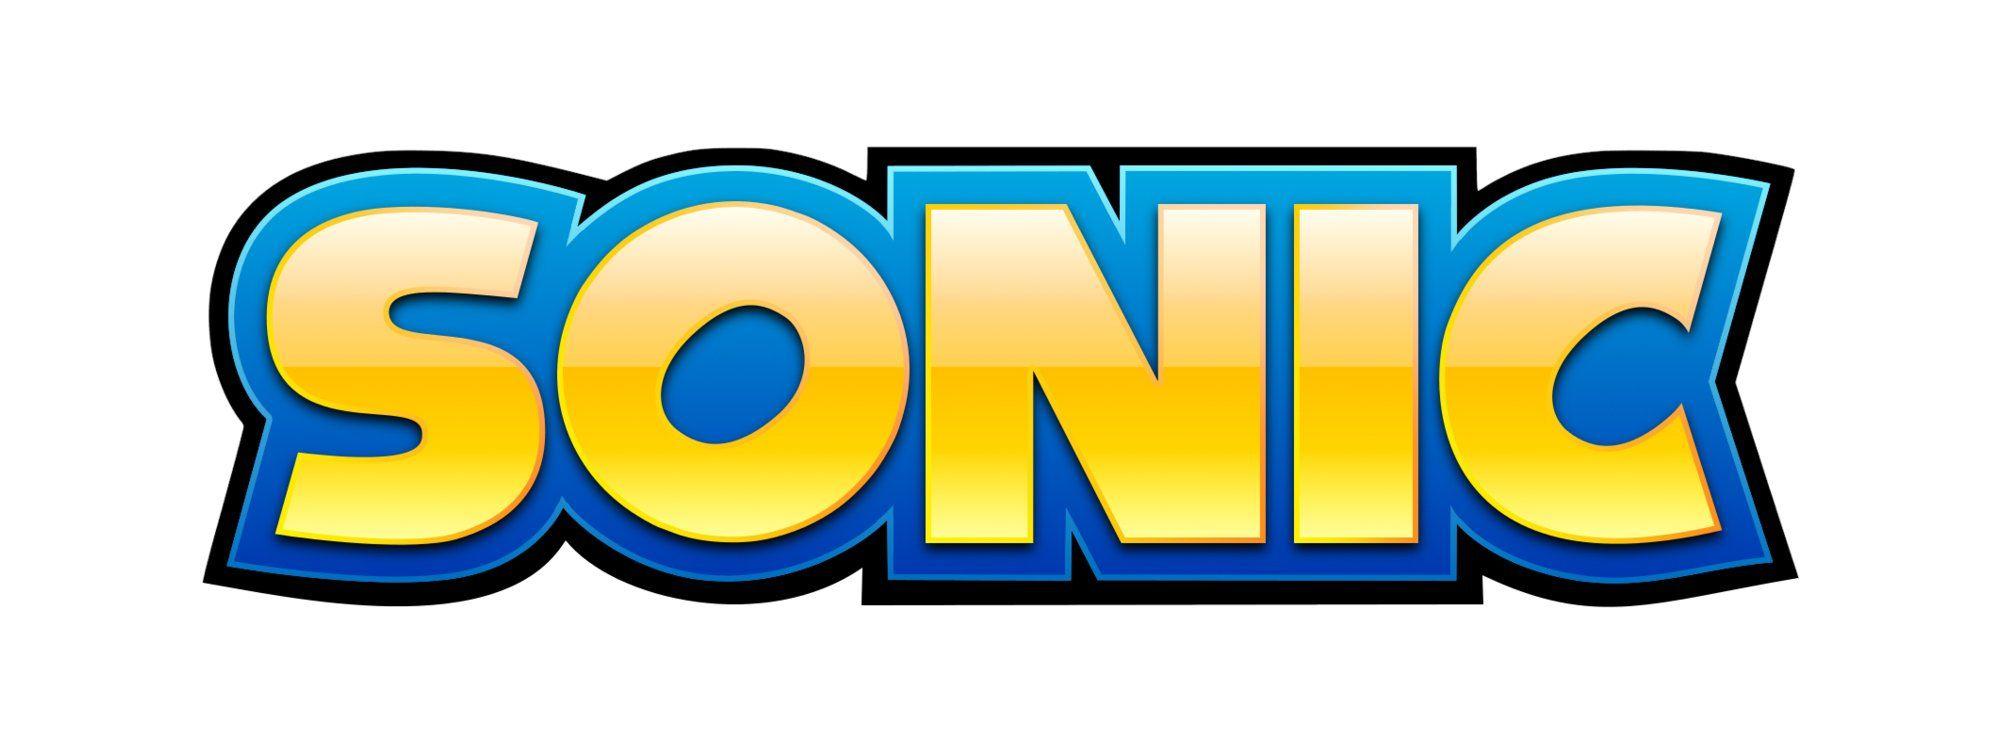 Meaning Sonic Logo And Symbol History And Evolution Festas De Aniversario Do Sonic Snoopy Desenho Enfeites De Aniversario Infantil